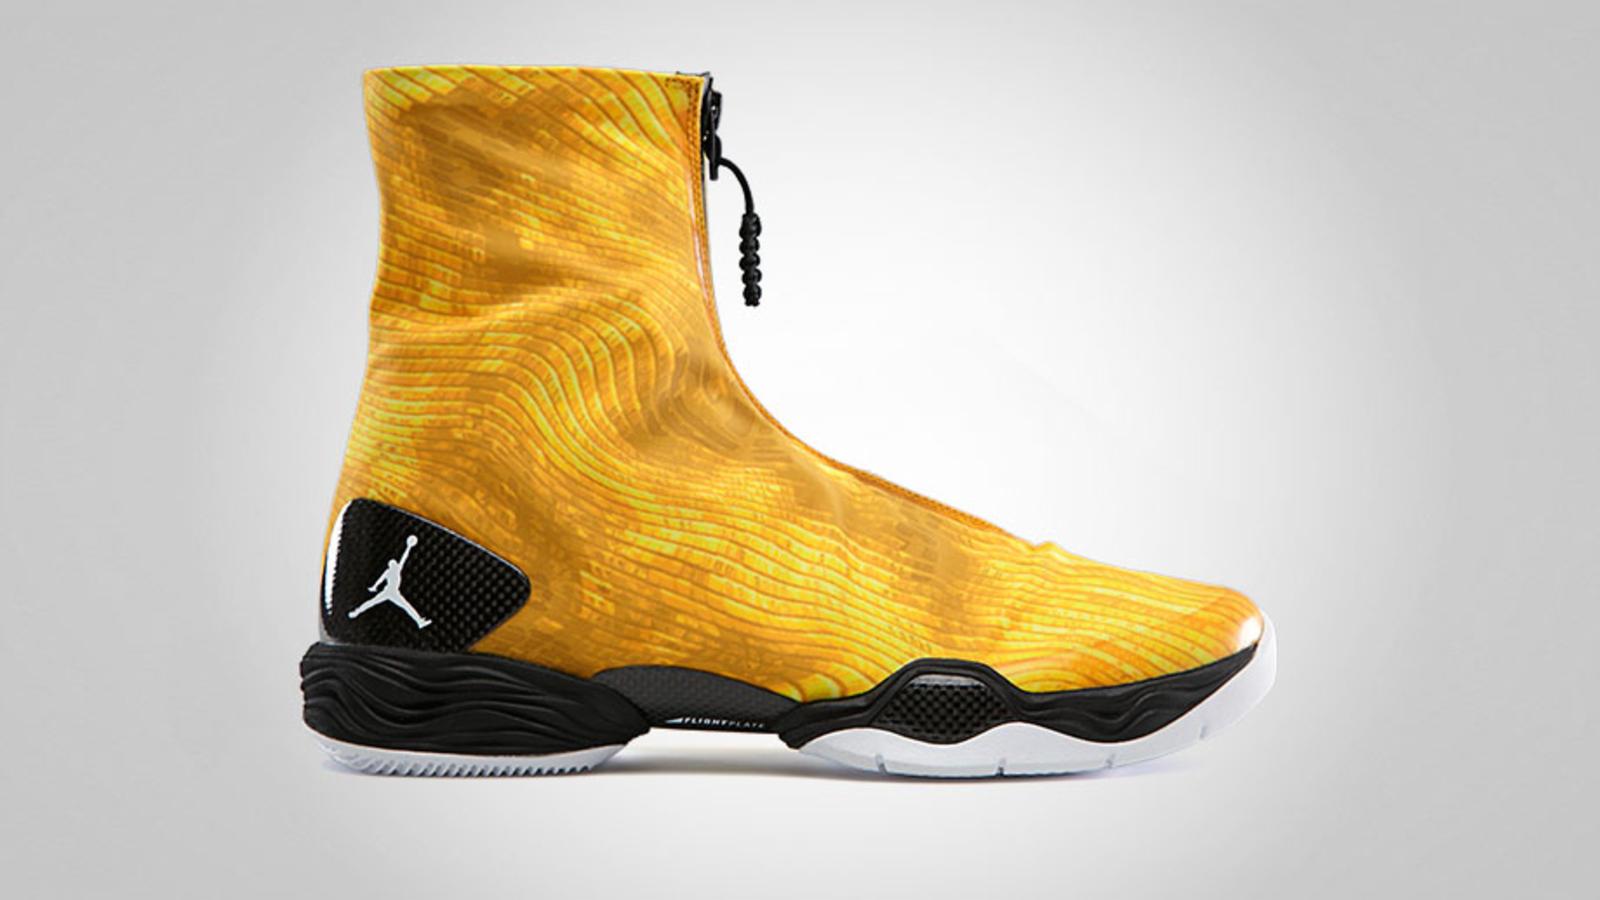 6debaff029a1 Jordan Brand takes flight with launch of AIR JORDAN XX8 - Nike News